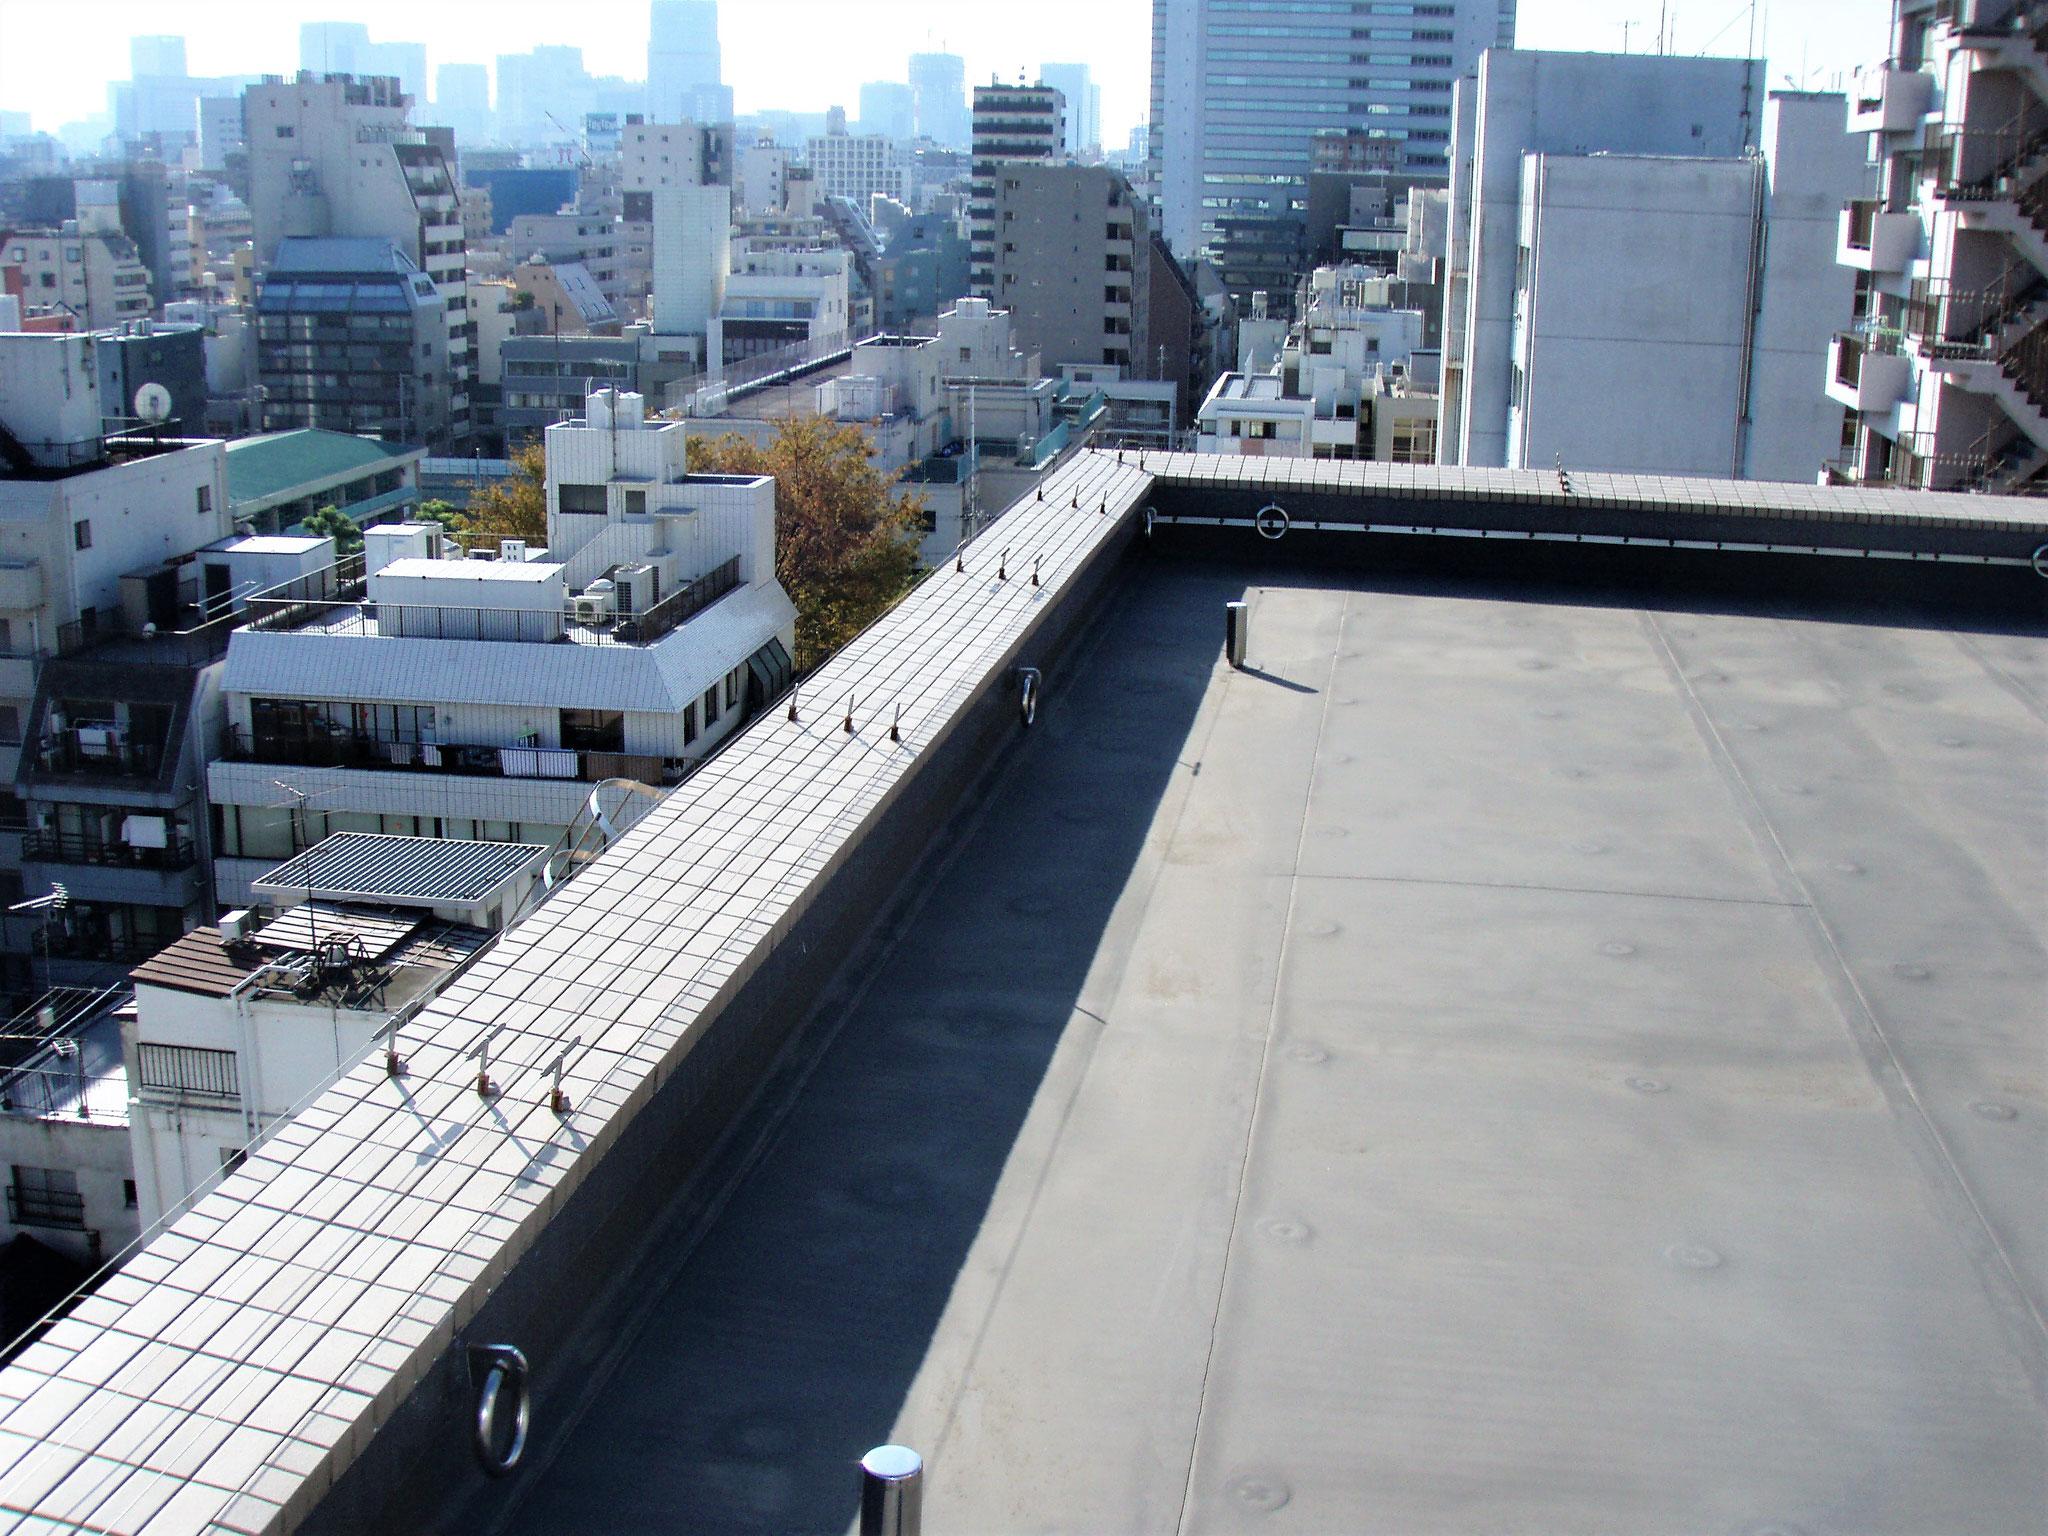 ストーク両国  / 東京都墨田区/2009.12.25